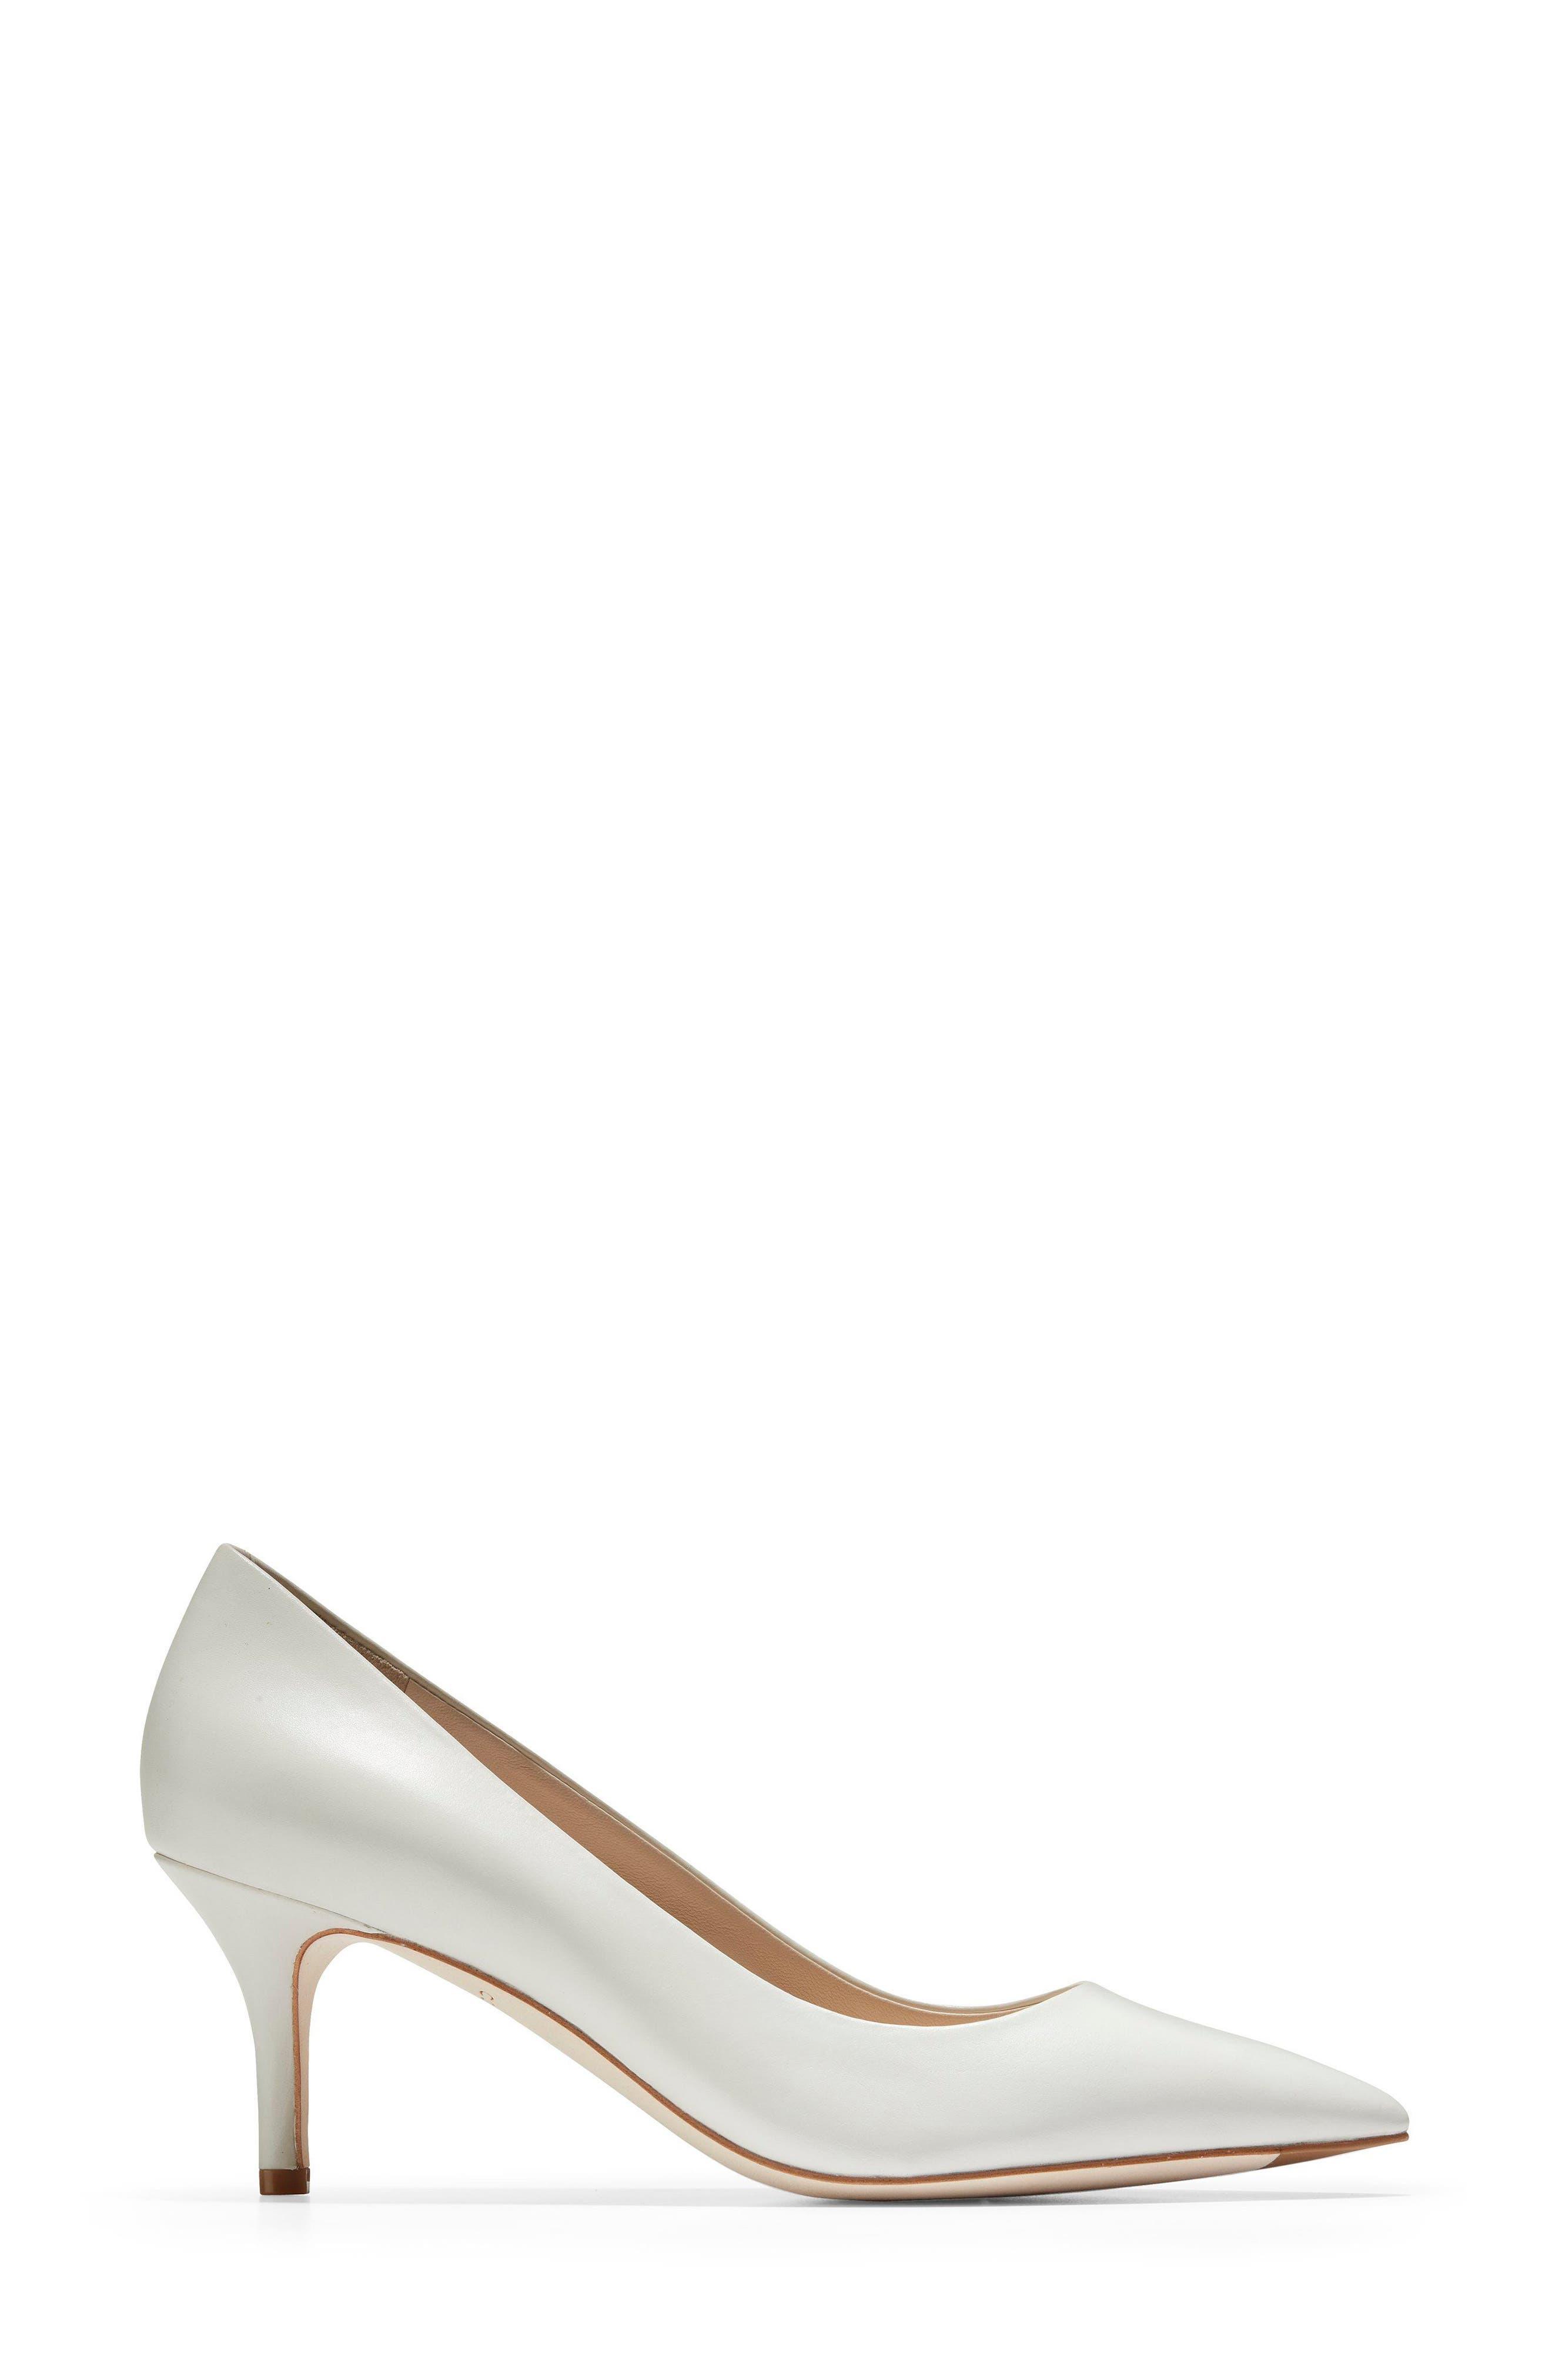 Vesta Pointy Toe Pump,                             Alternate thumbnail 3, color,                             WHITE LEATHER